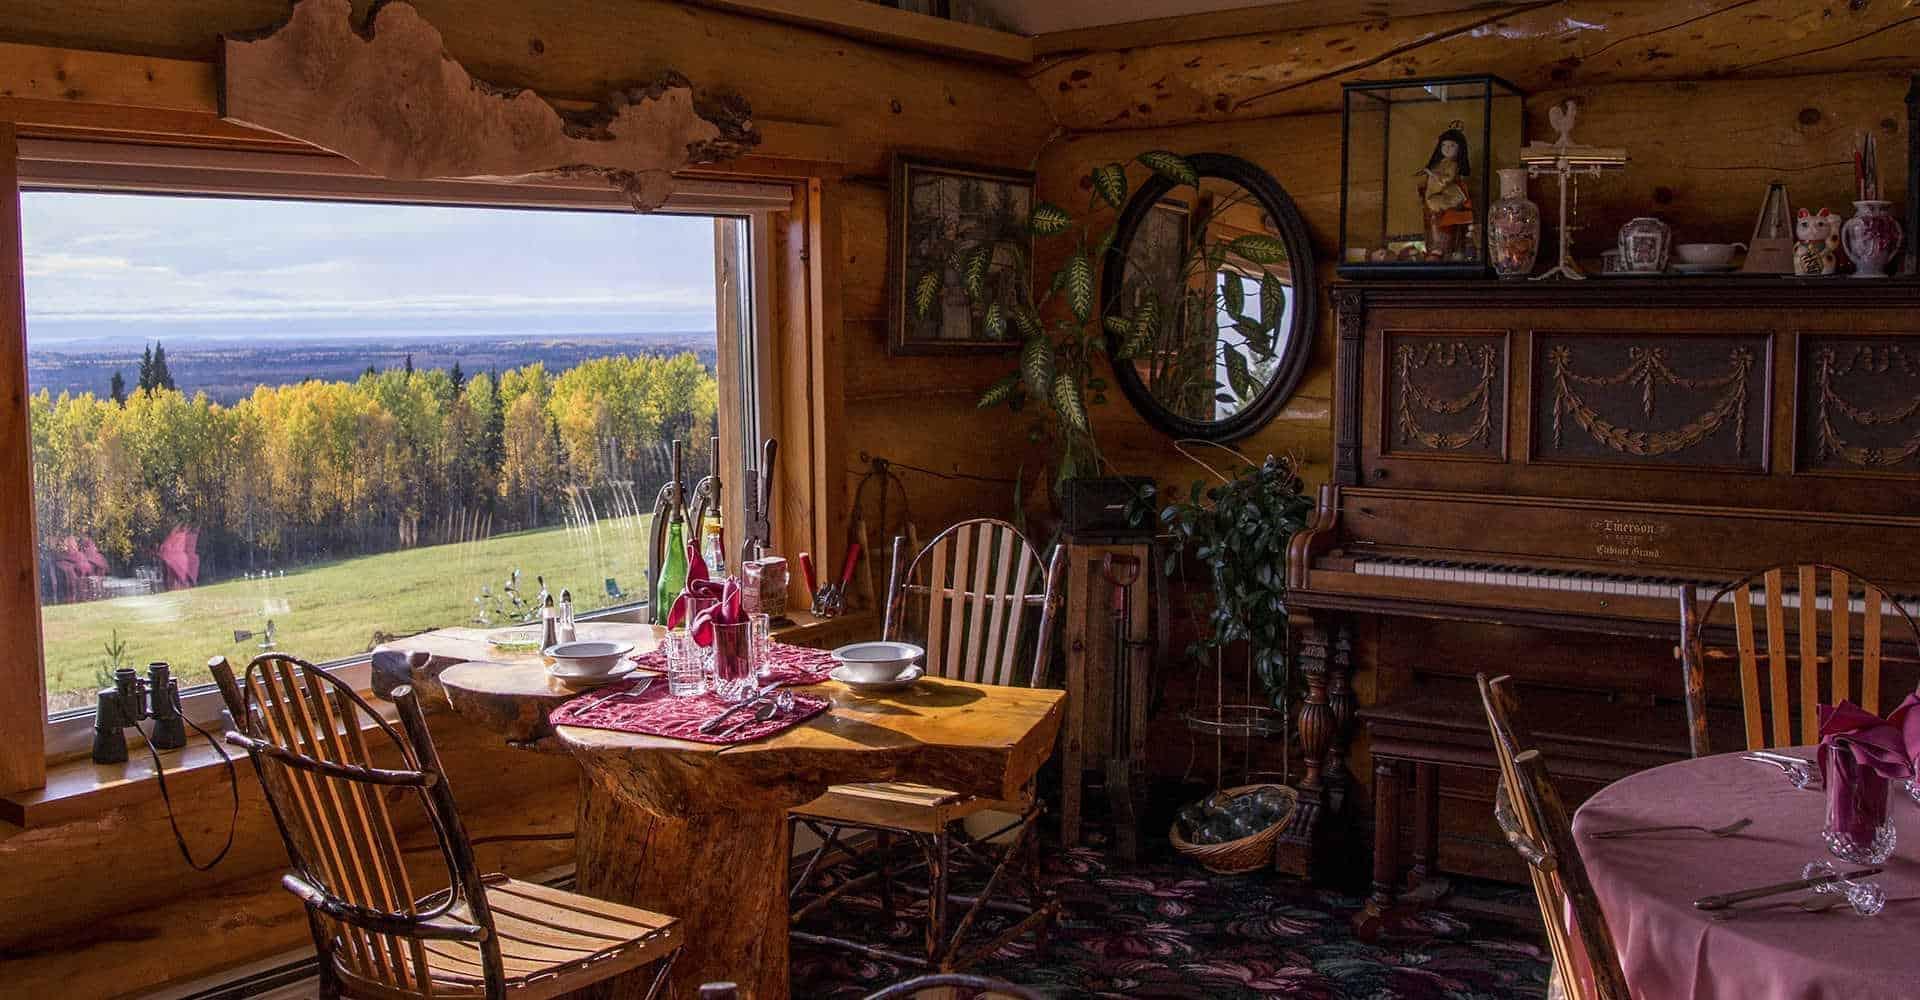 fairbanks alaska bed and breakfast. unsual hotels